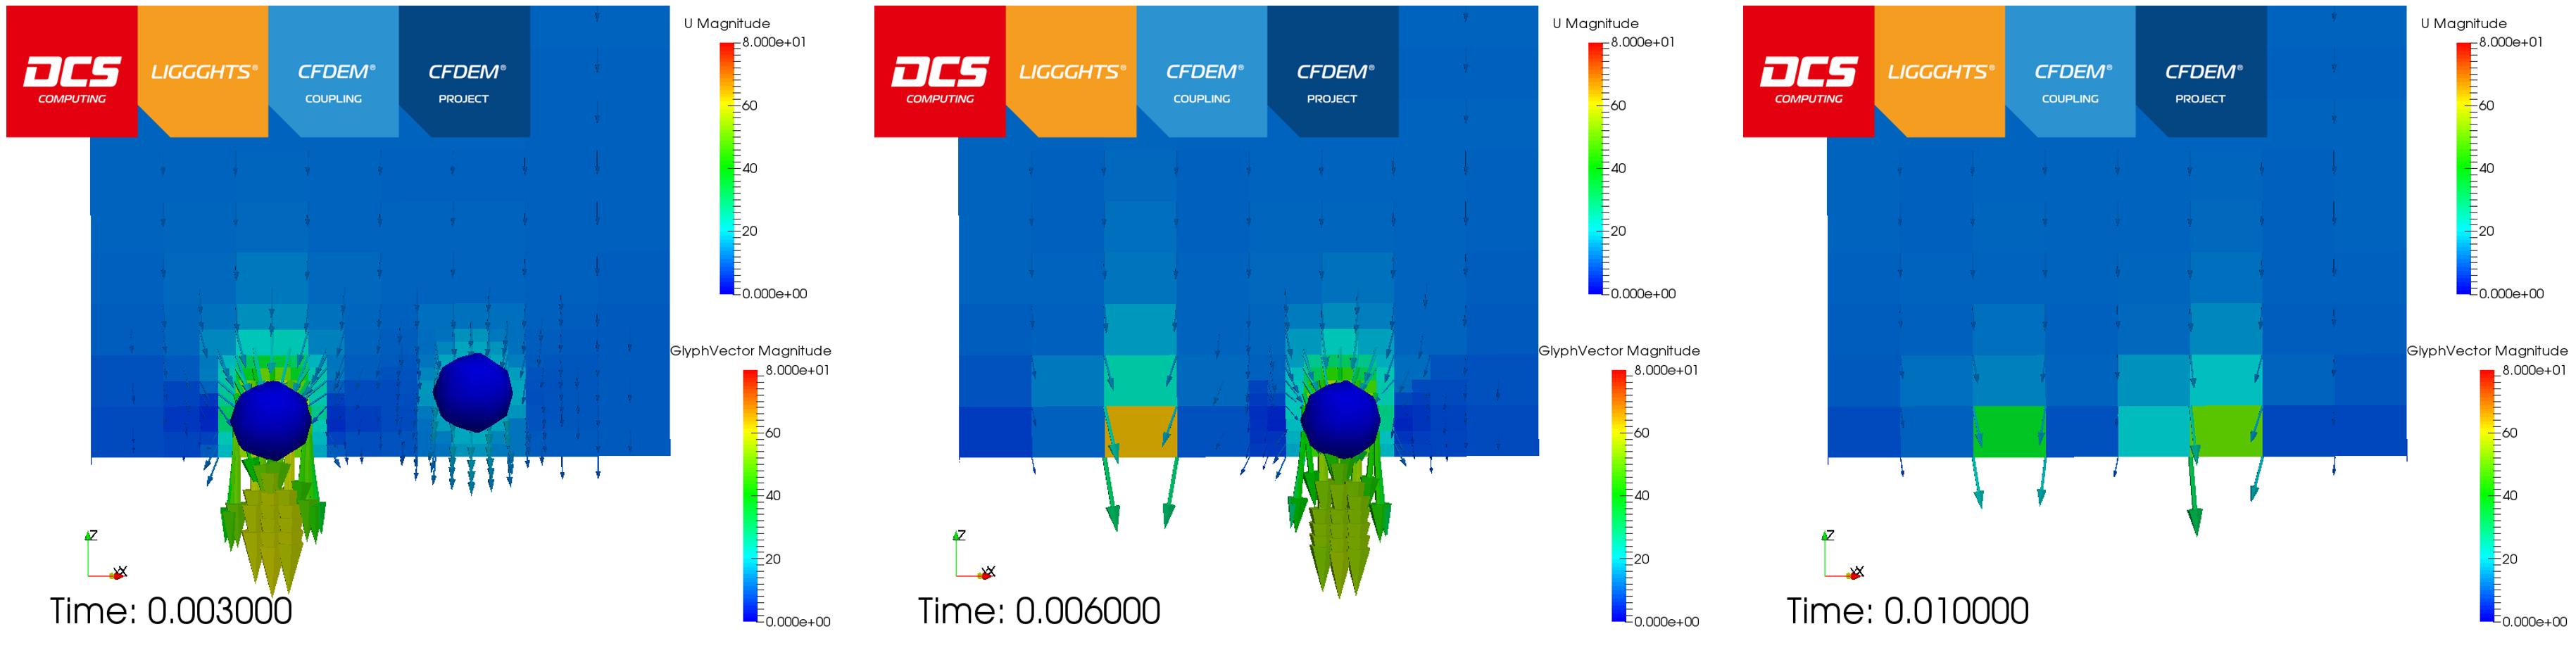 CFDEM®coupling Version History | CFDEM®project